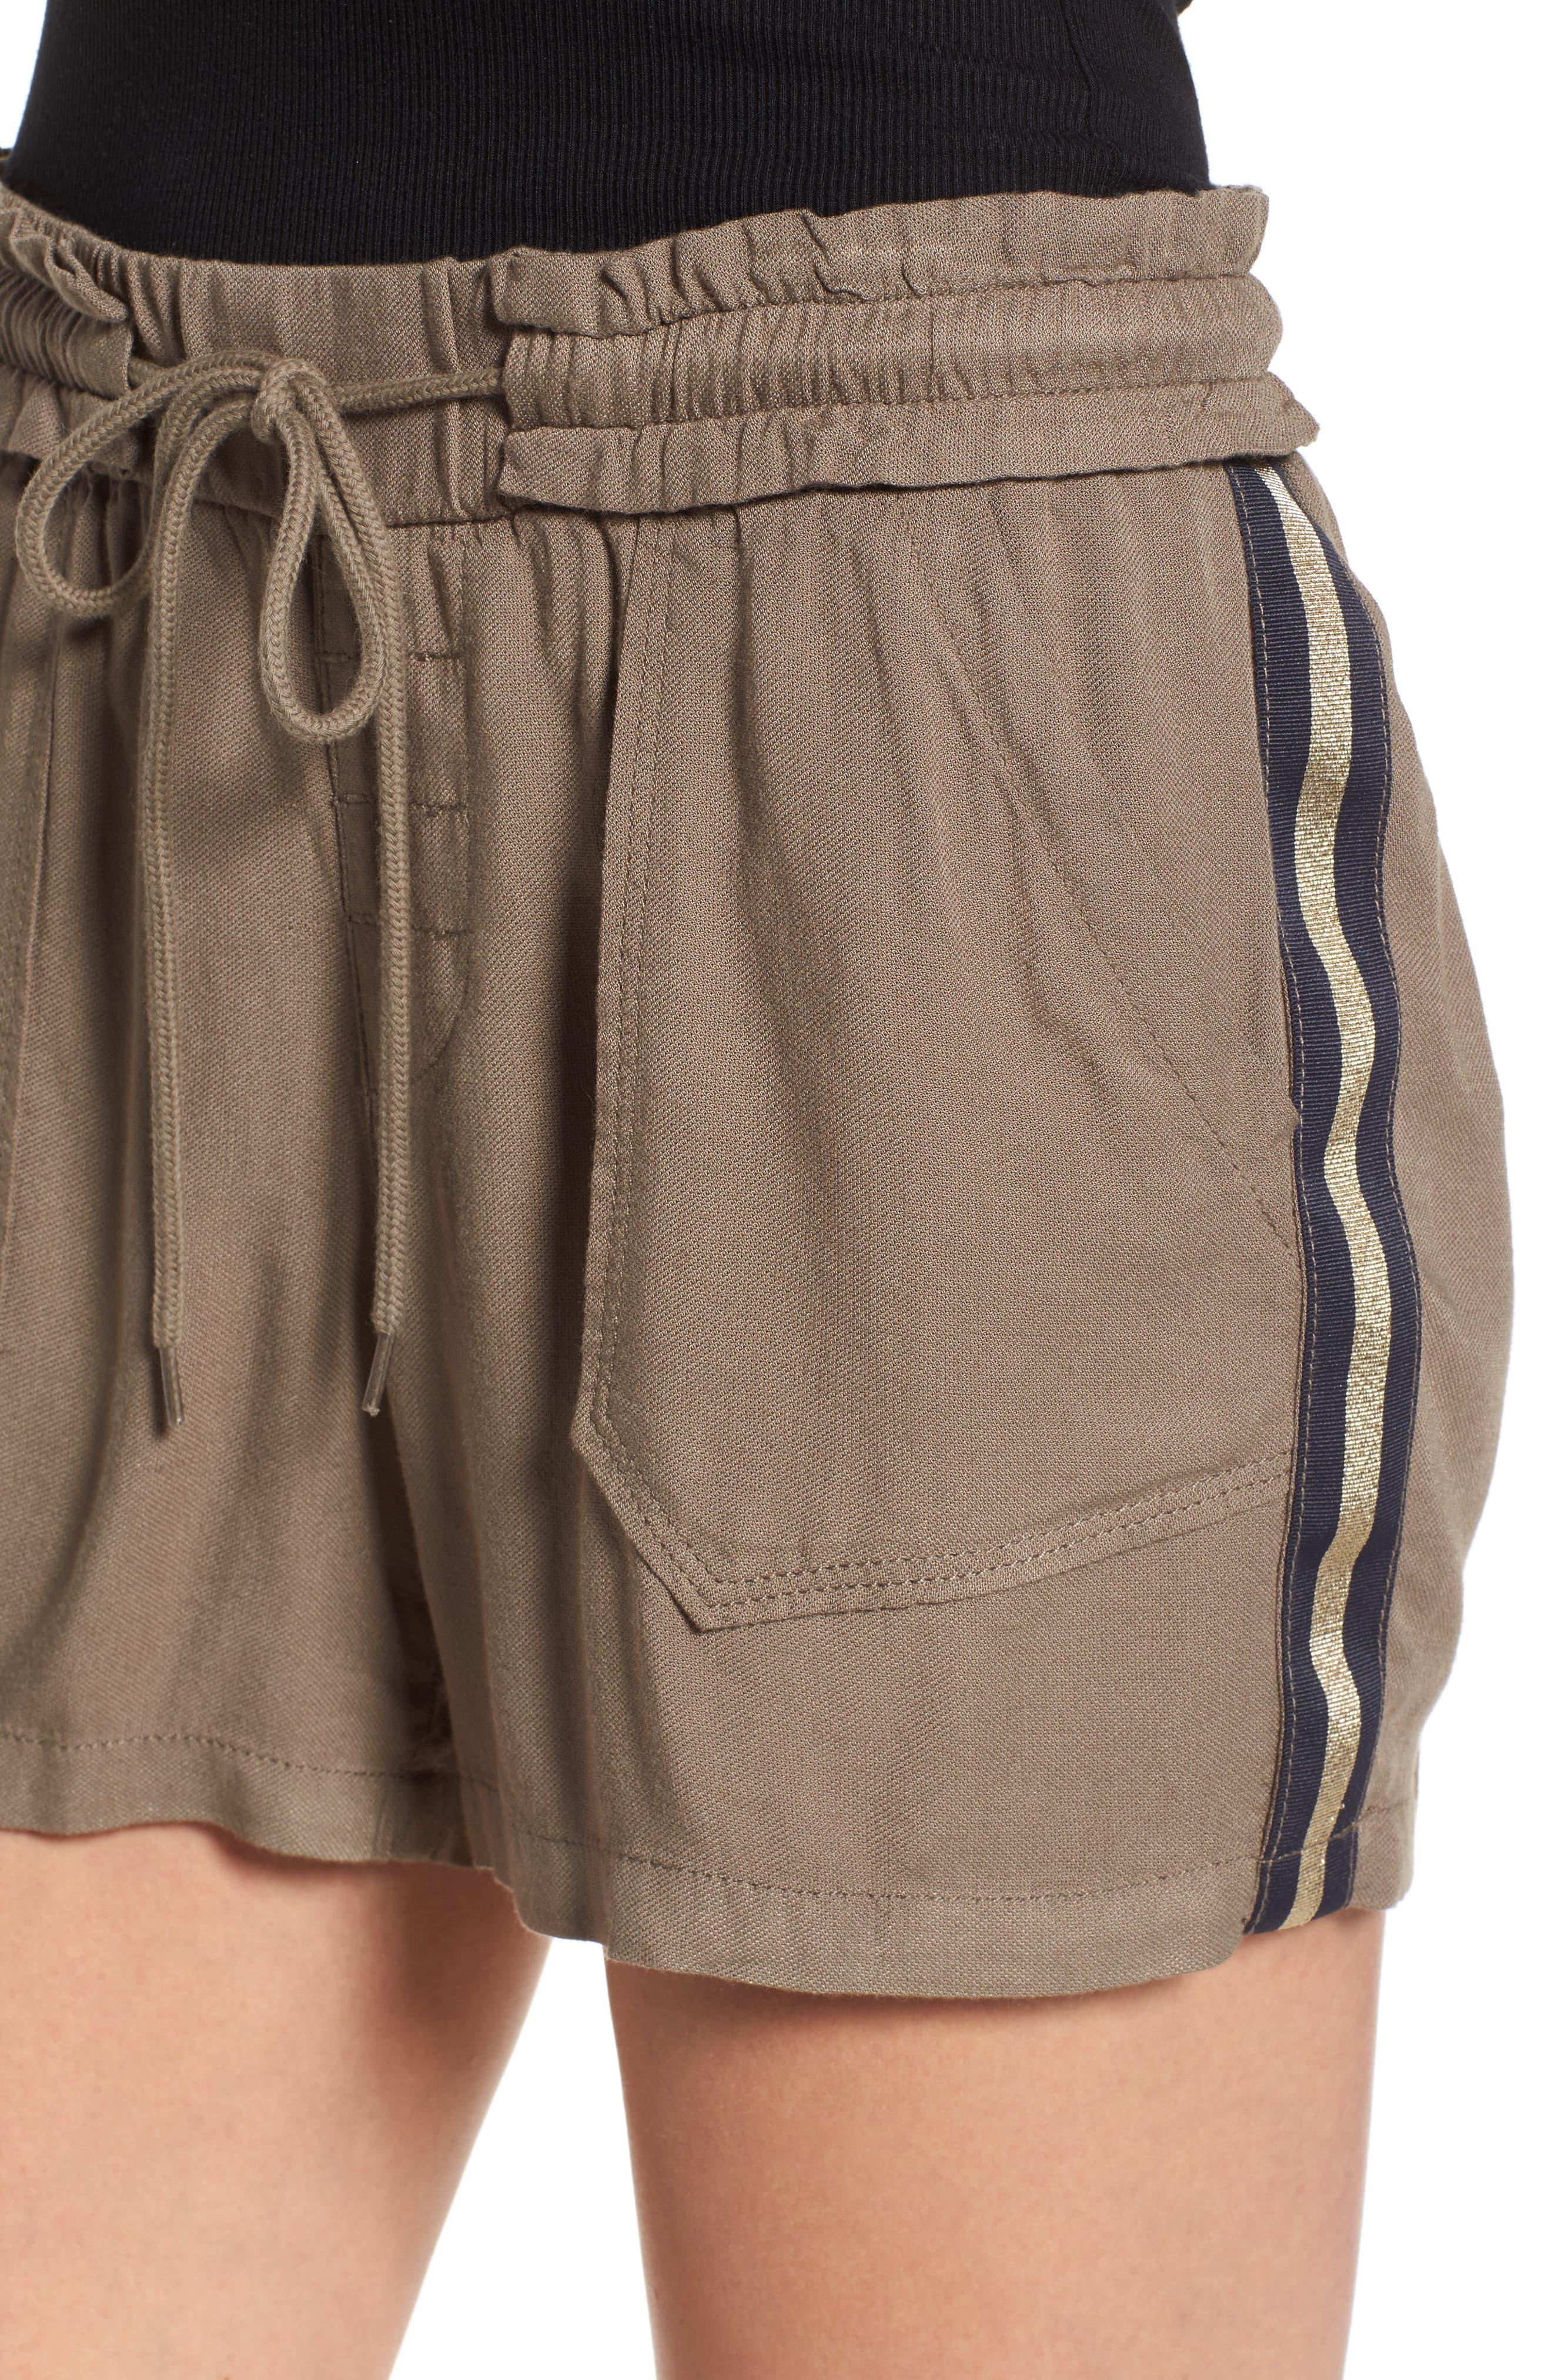 Drawstring Shorts,                             Alternate thumbnail 4, color,                             335